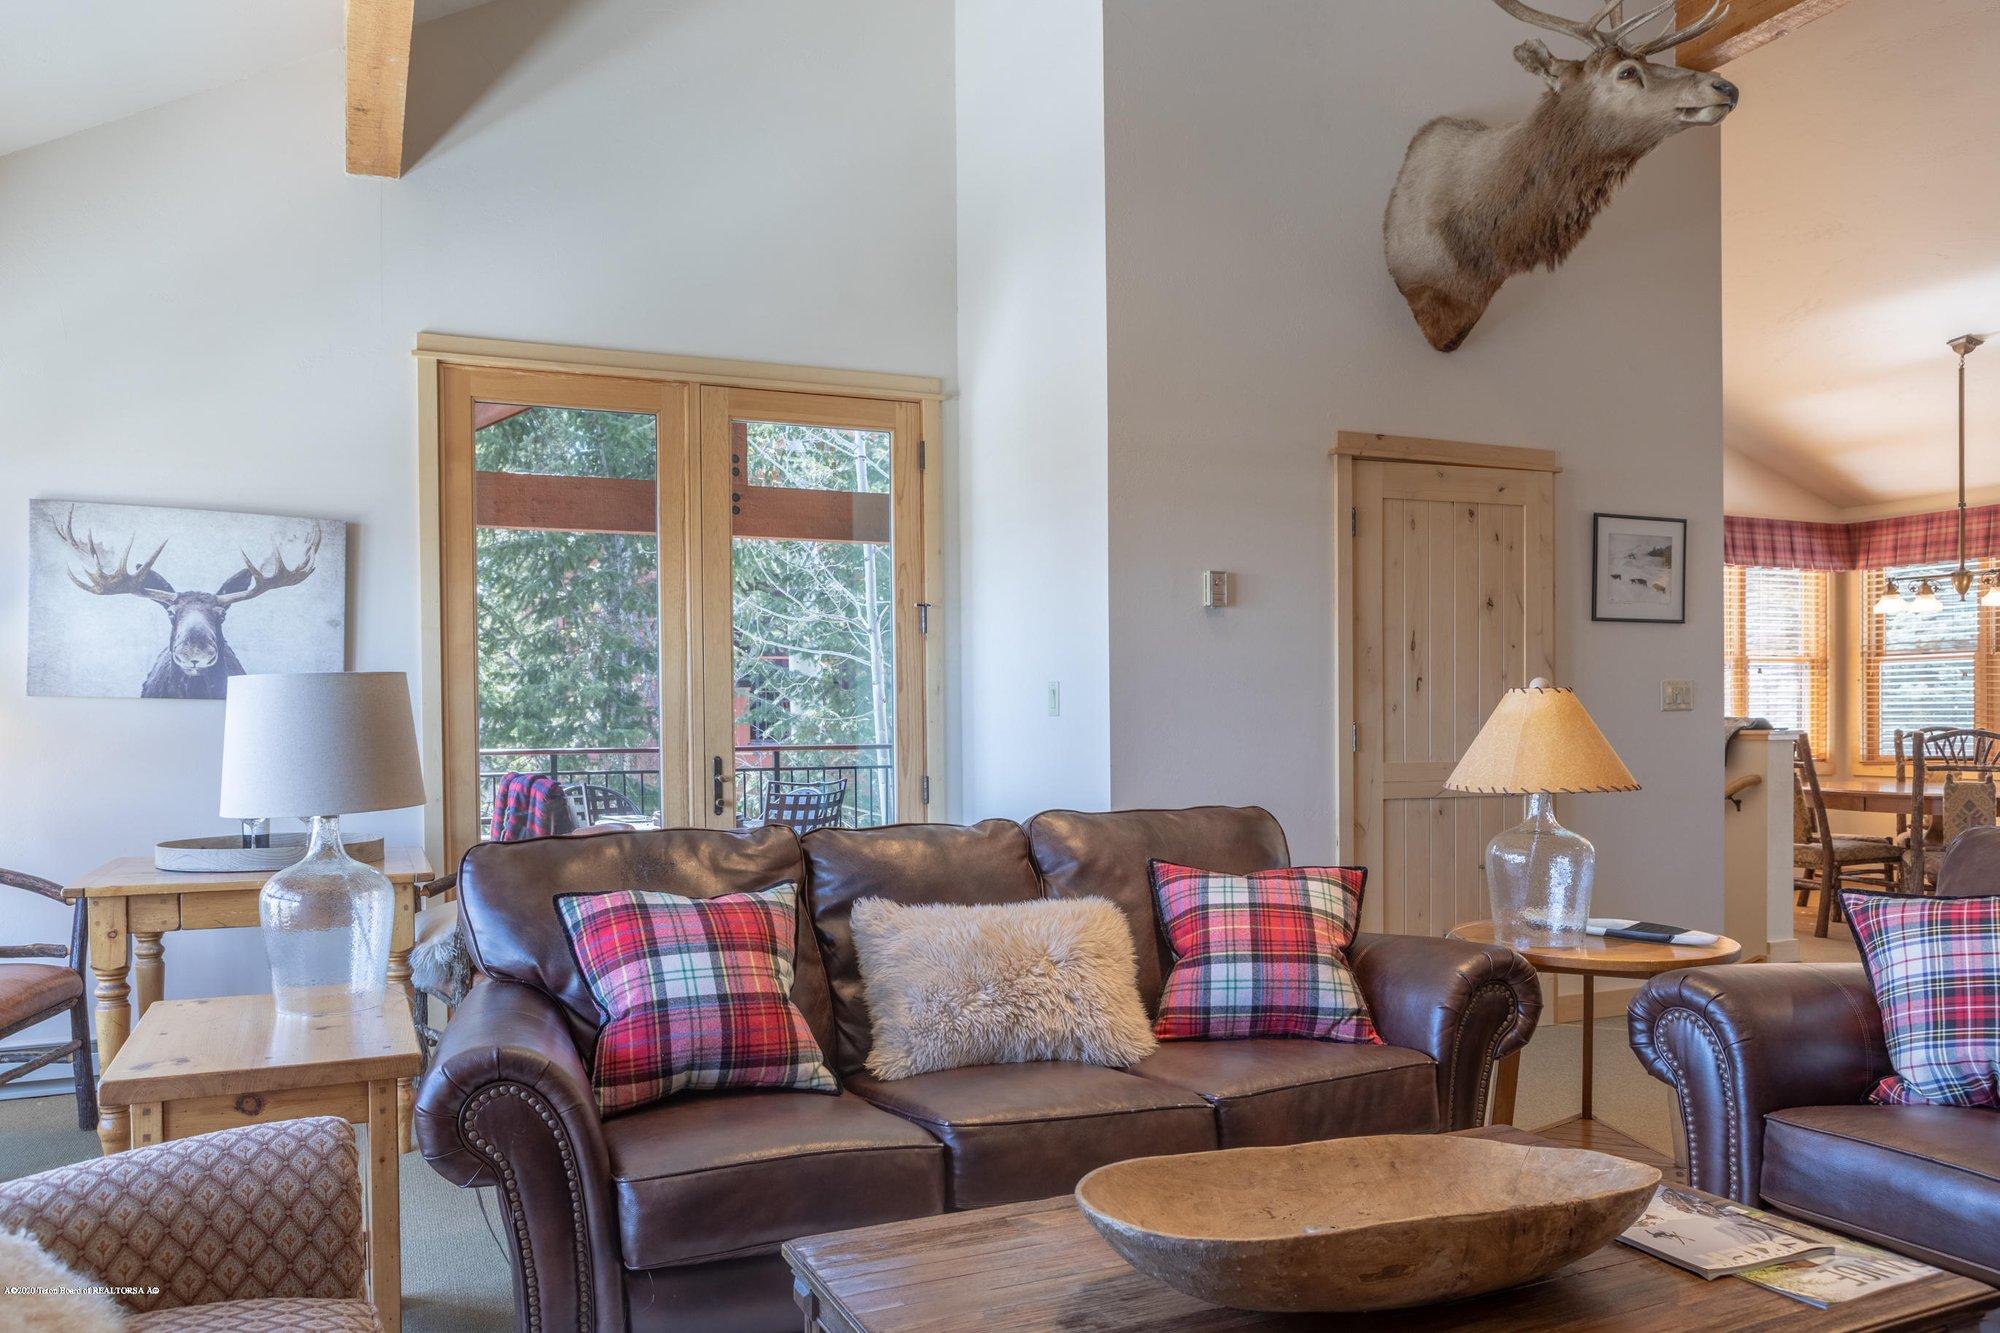 Apartment in Teton Village, Wyoming, United States 1